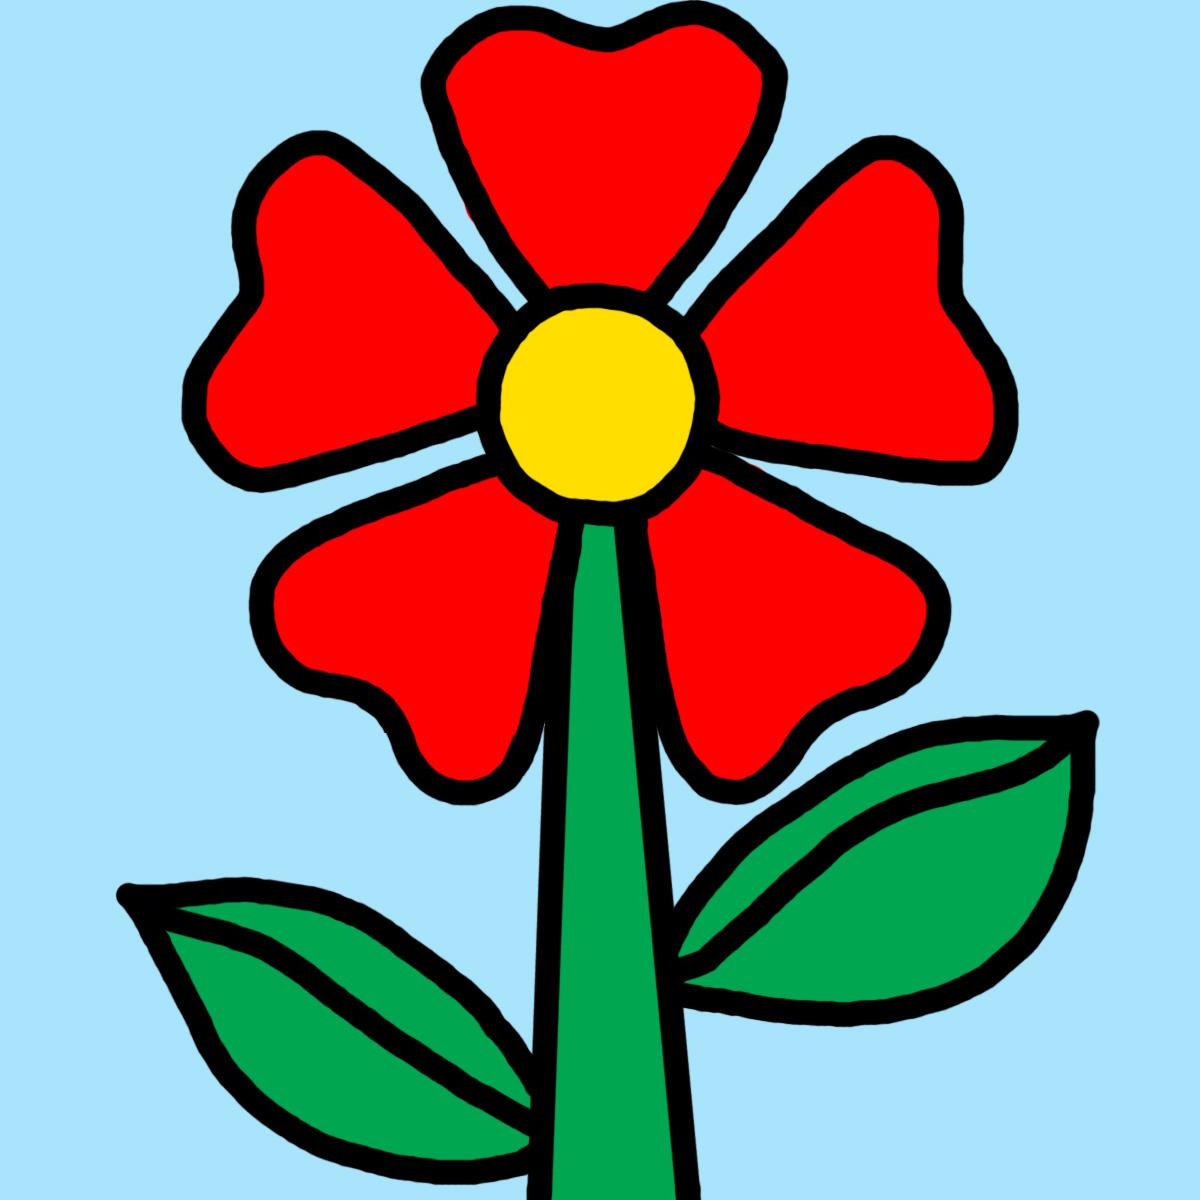 Single Flower Cartoon - ClipArt Best